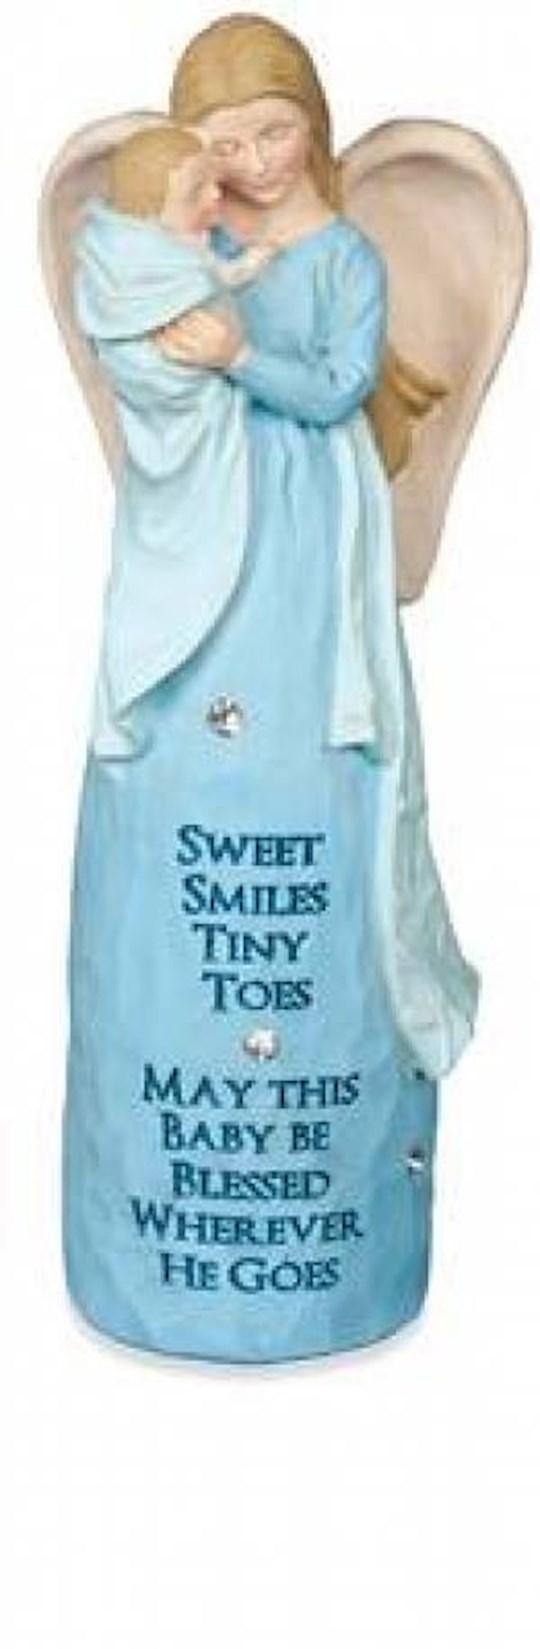 "Figurine-Jewels Of Faith-New Baby Angel-Blue (5.5"") | SHOPtheWORD"